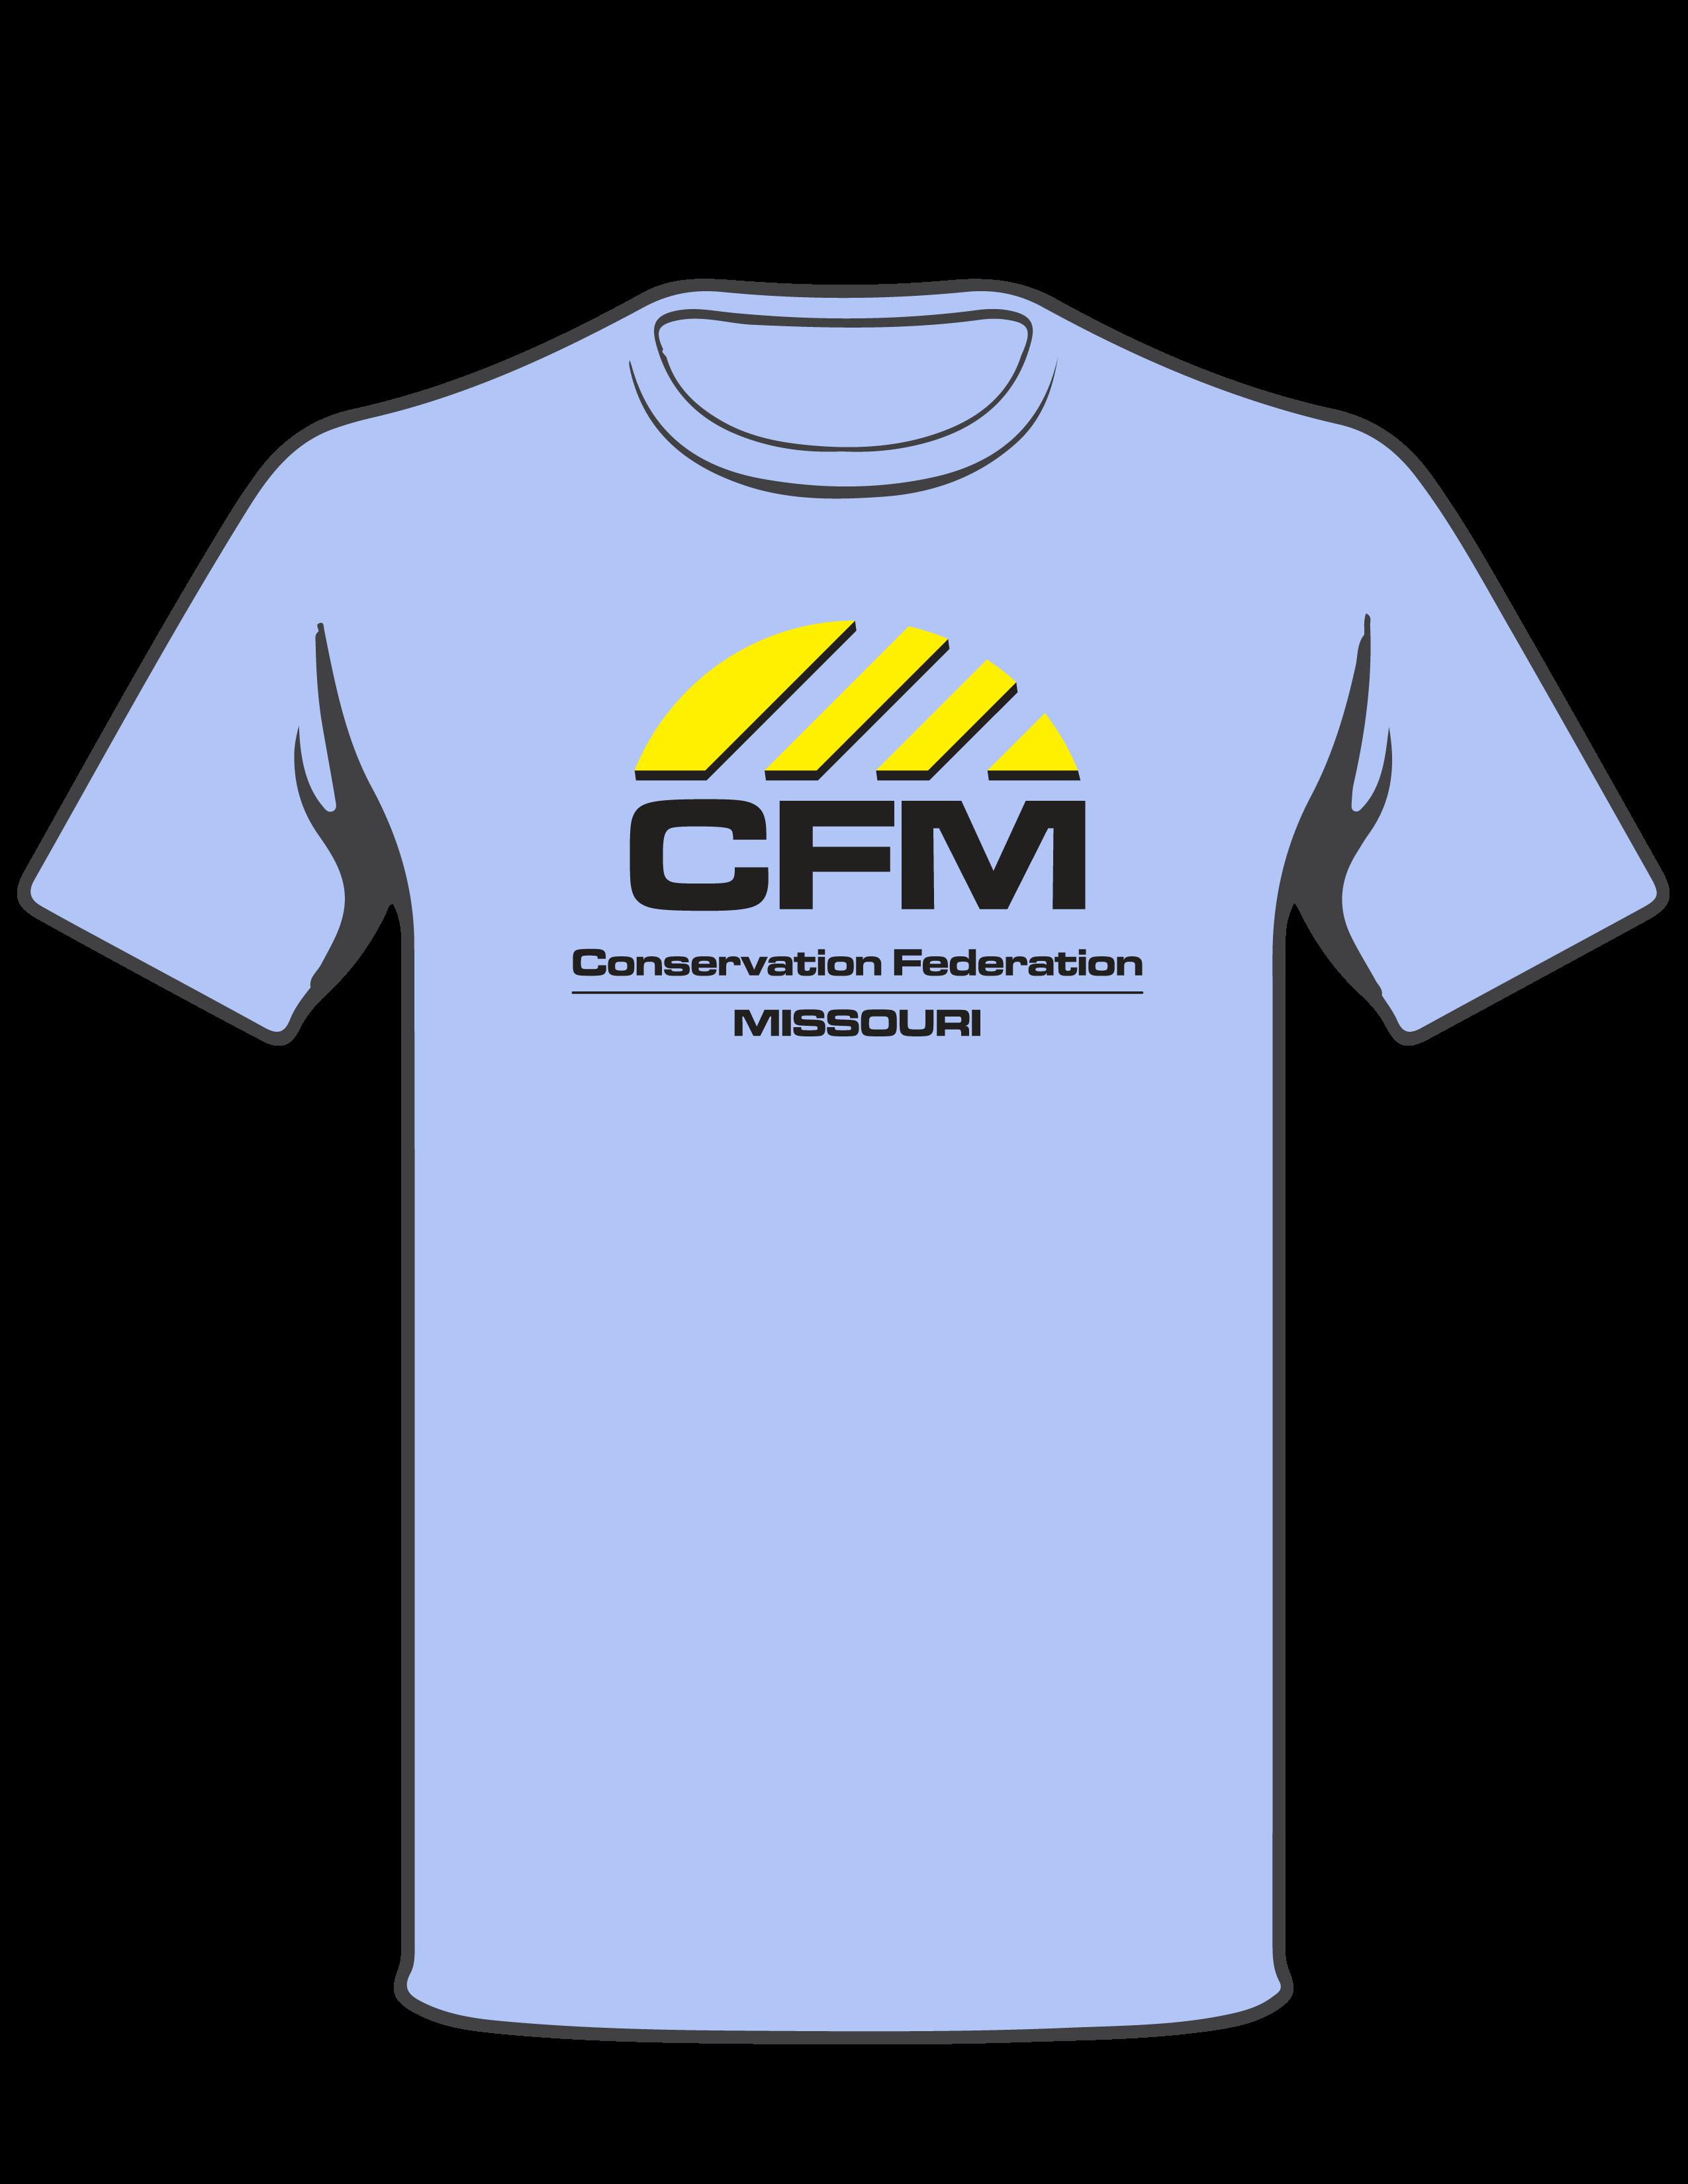 cfm logo. cfm logo shirt - blue cfm t